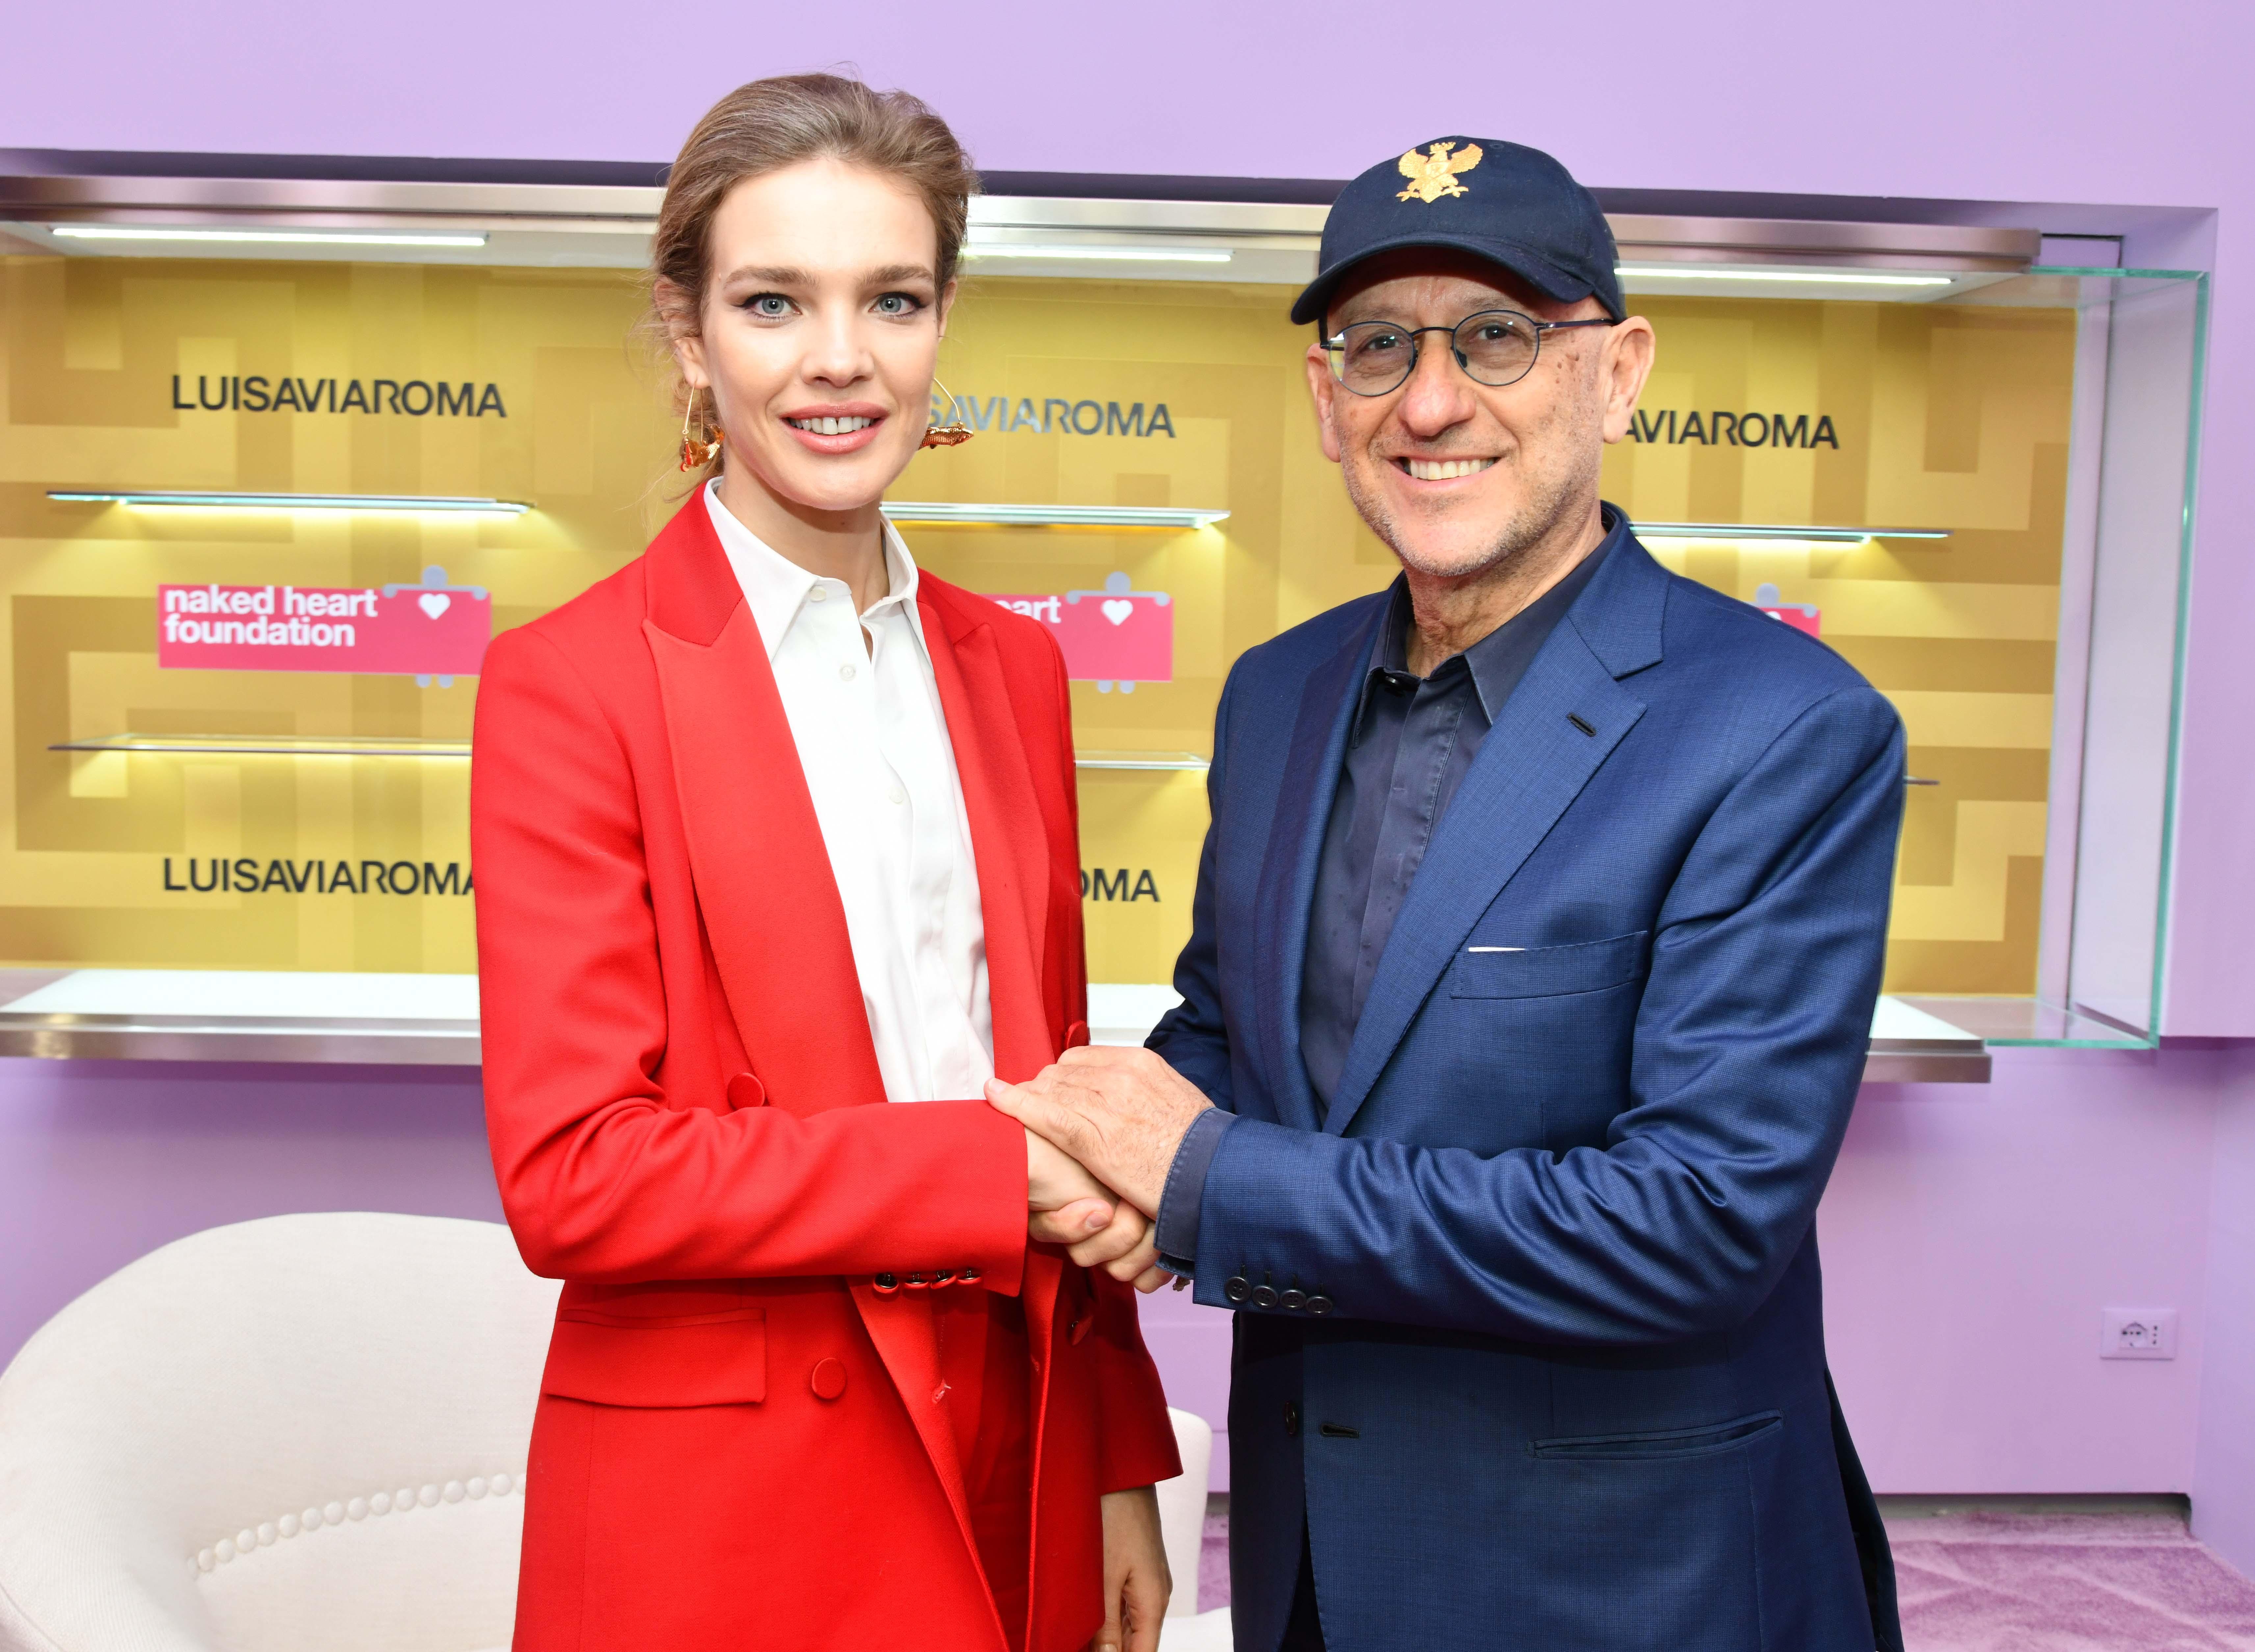 Natalia Vodianova with Andrea Panconesi at the LuisaViaRoma store in Florence.